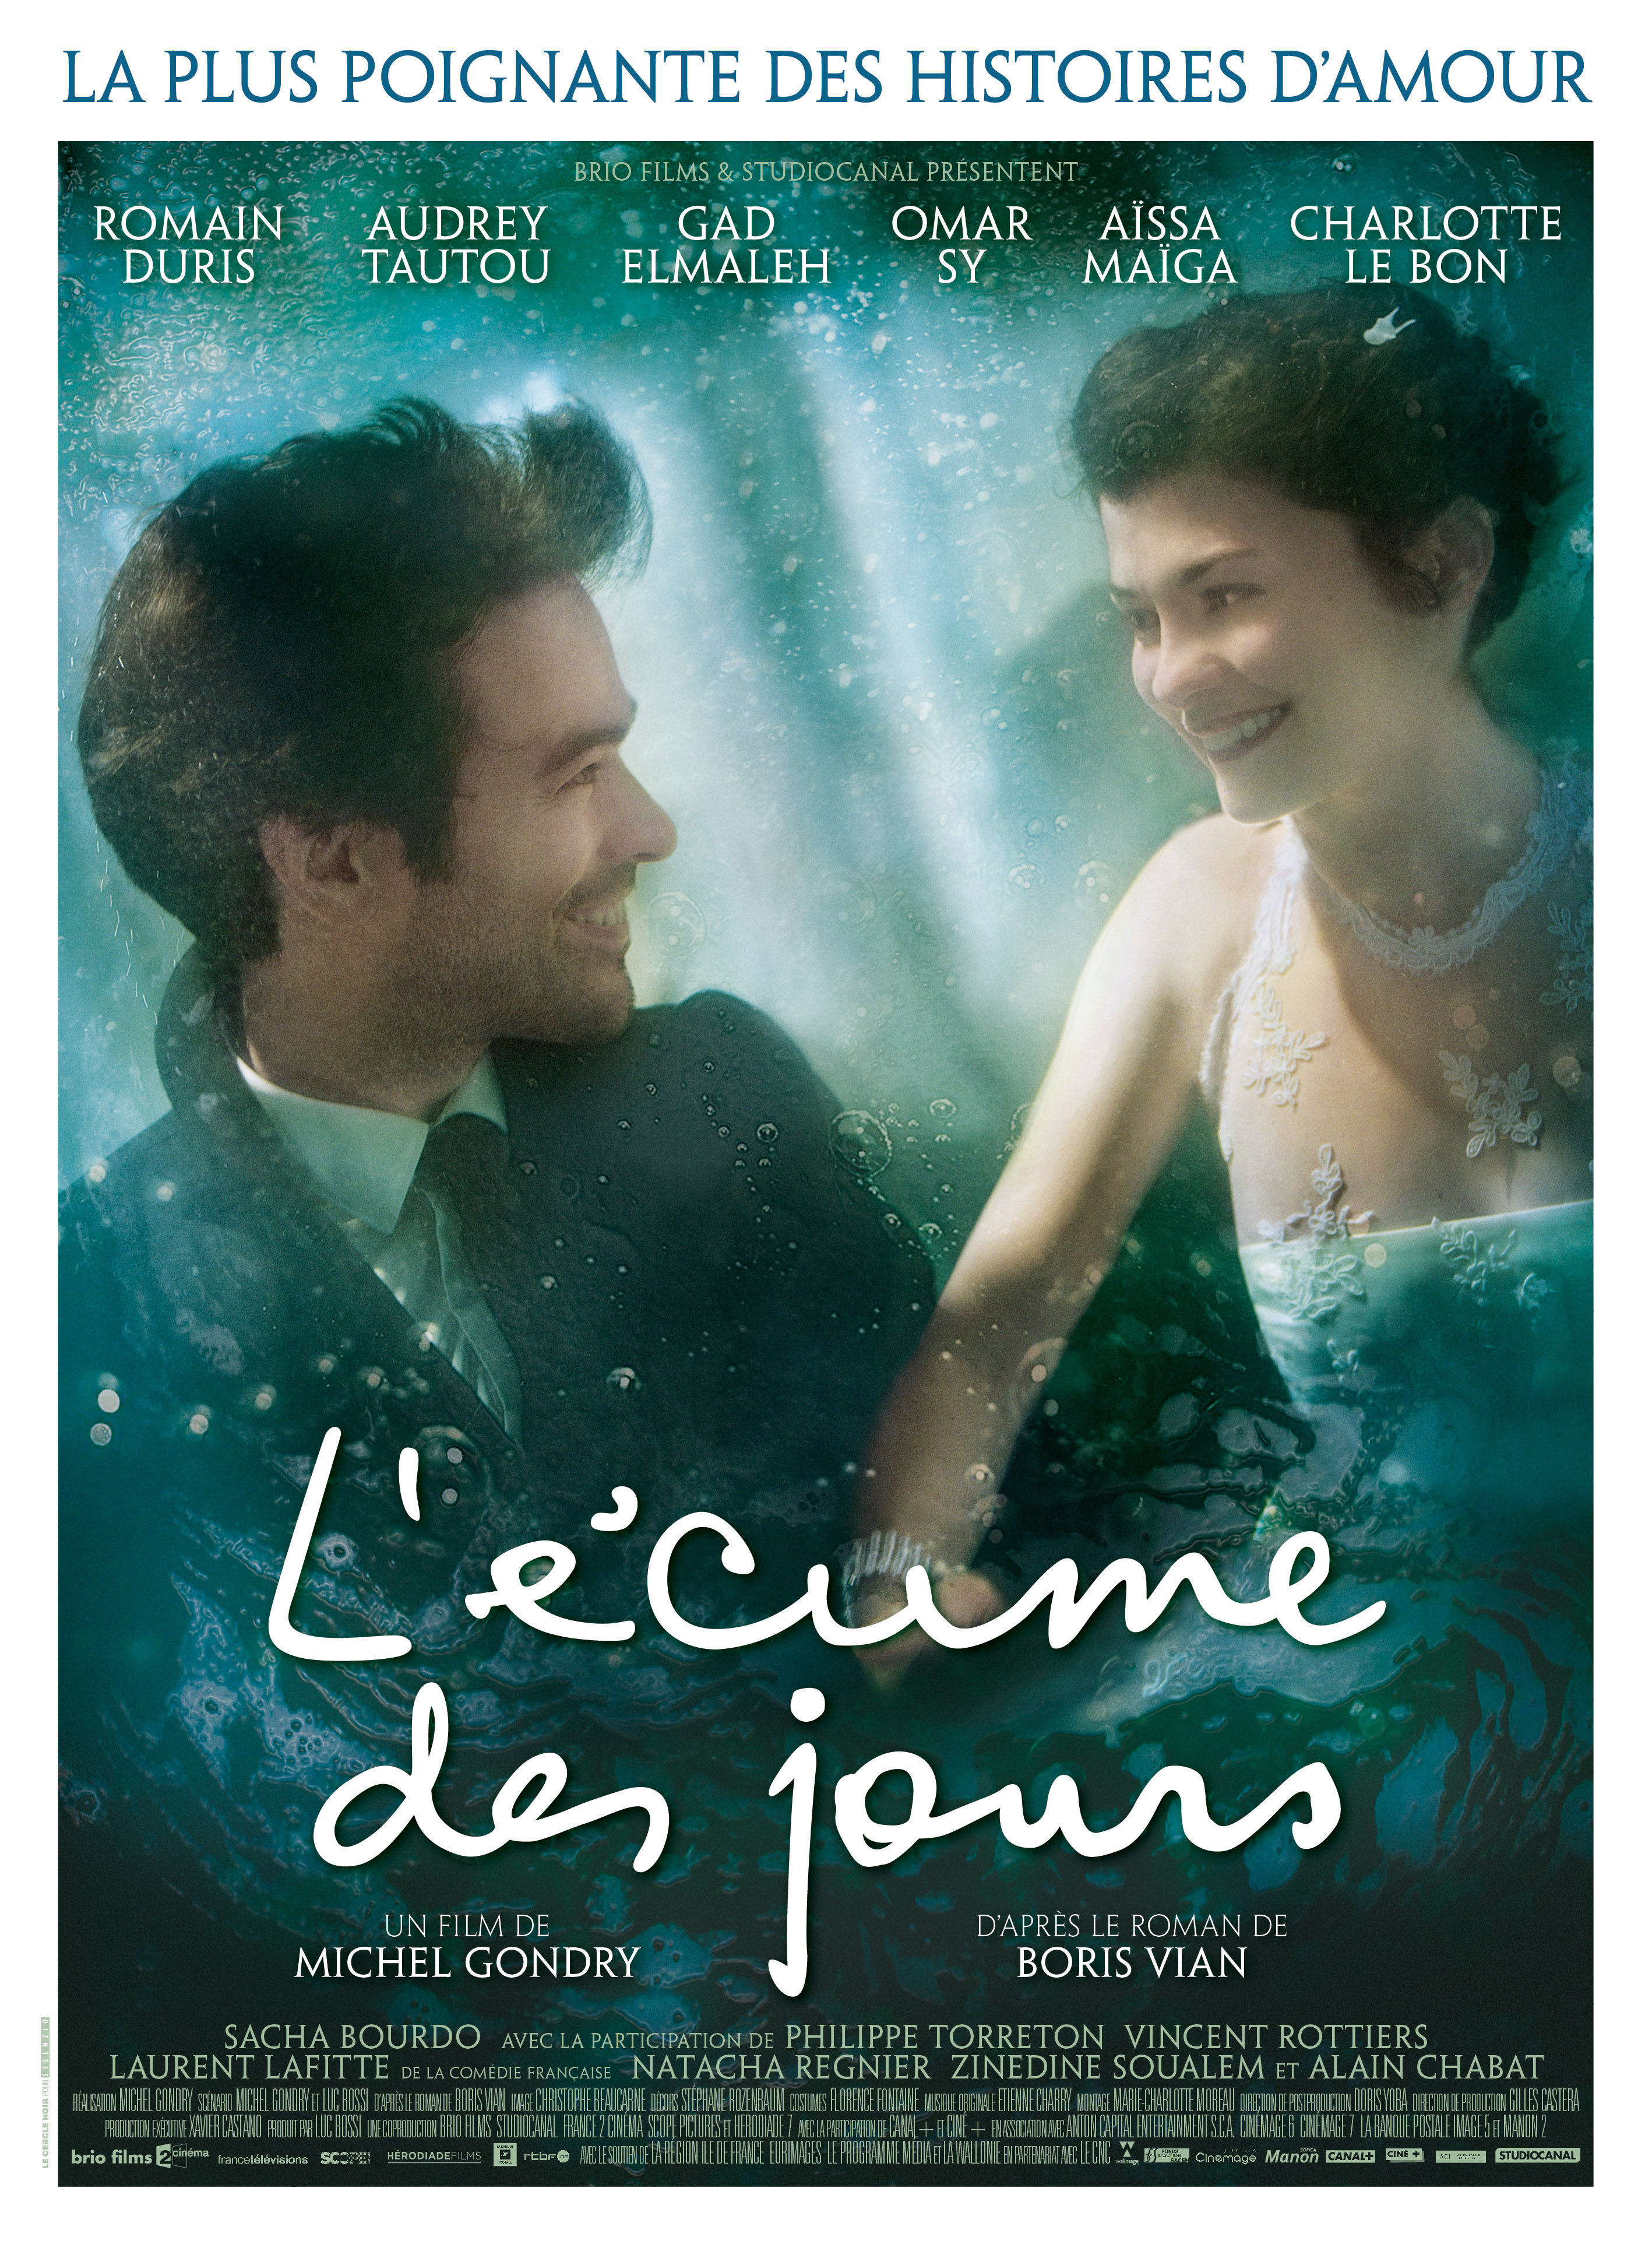 Пена дней (L ecume des jours, 2013) рекомендации